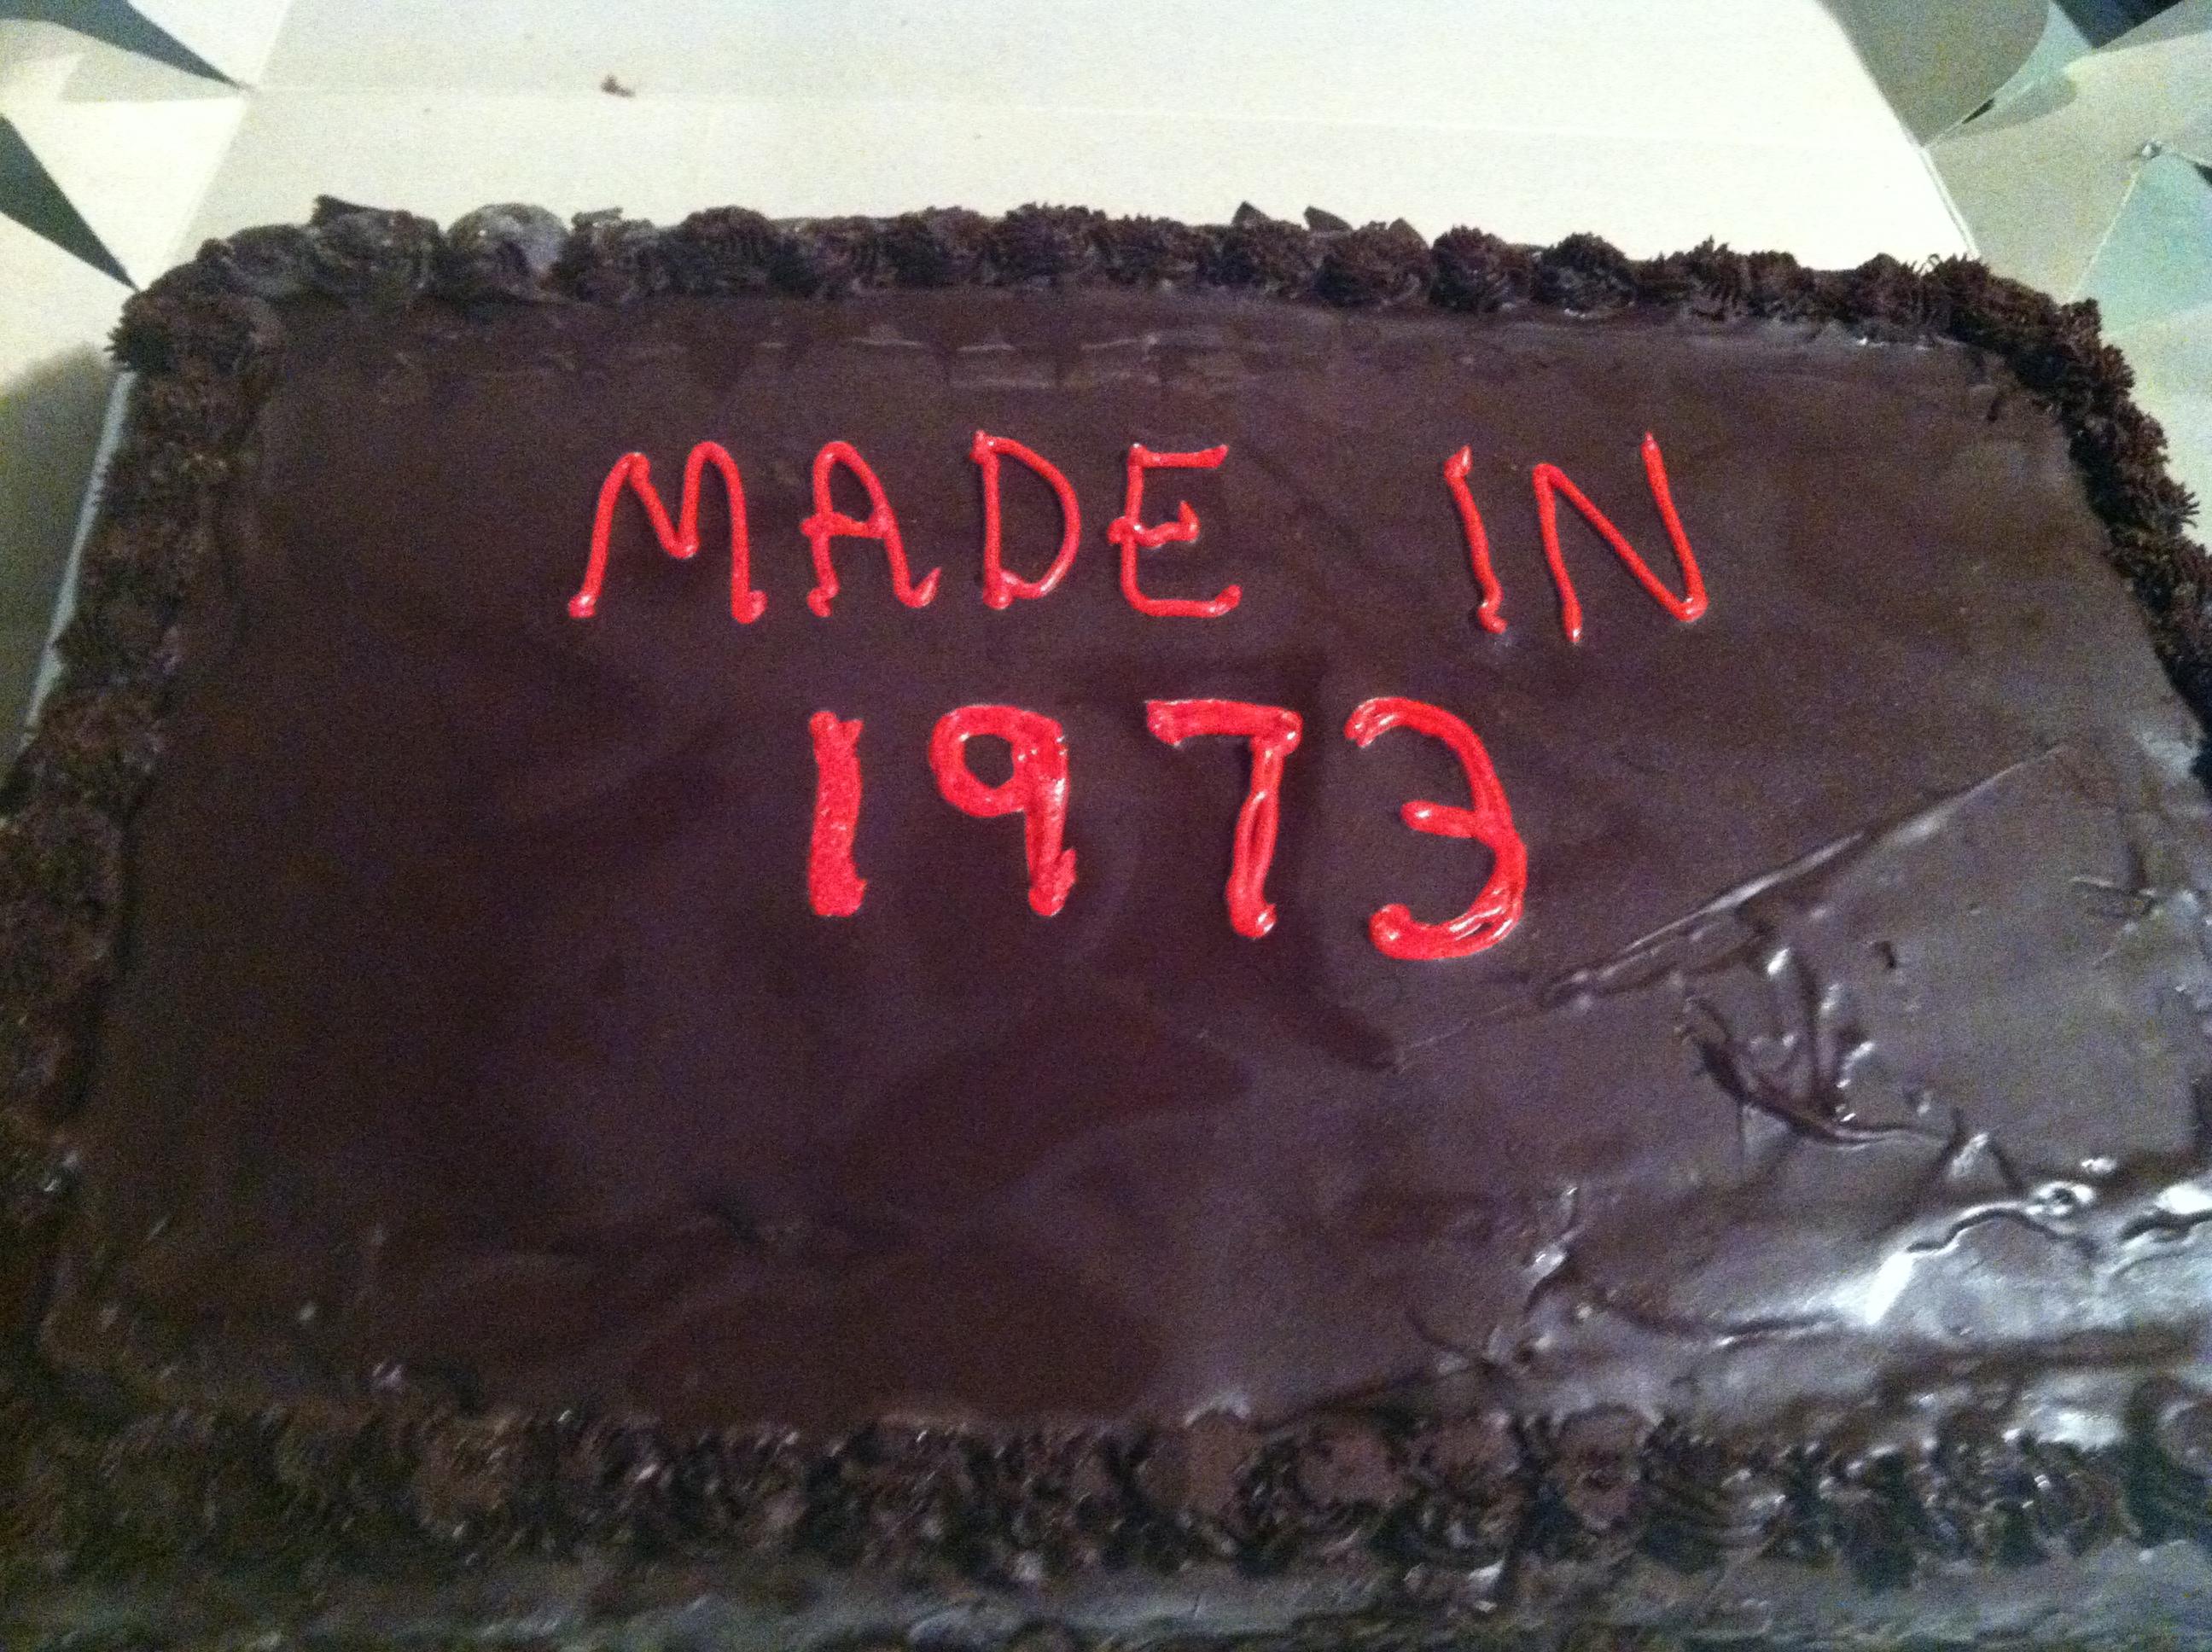 Random Images Cold Stone Creamery Ganache Birthday Cake Hd Wallpaper